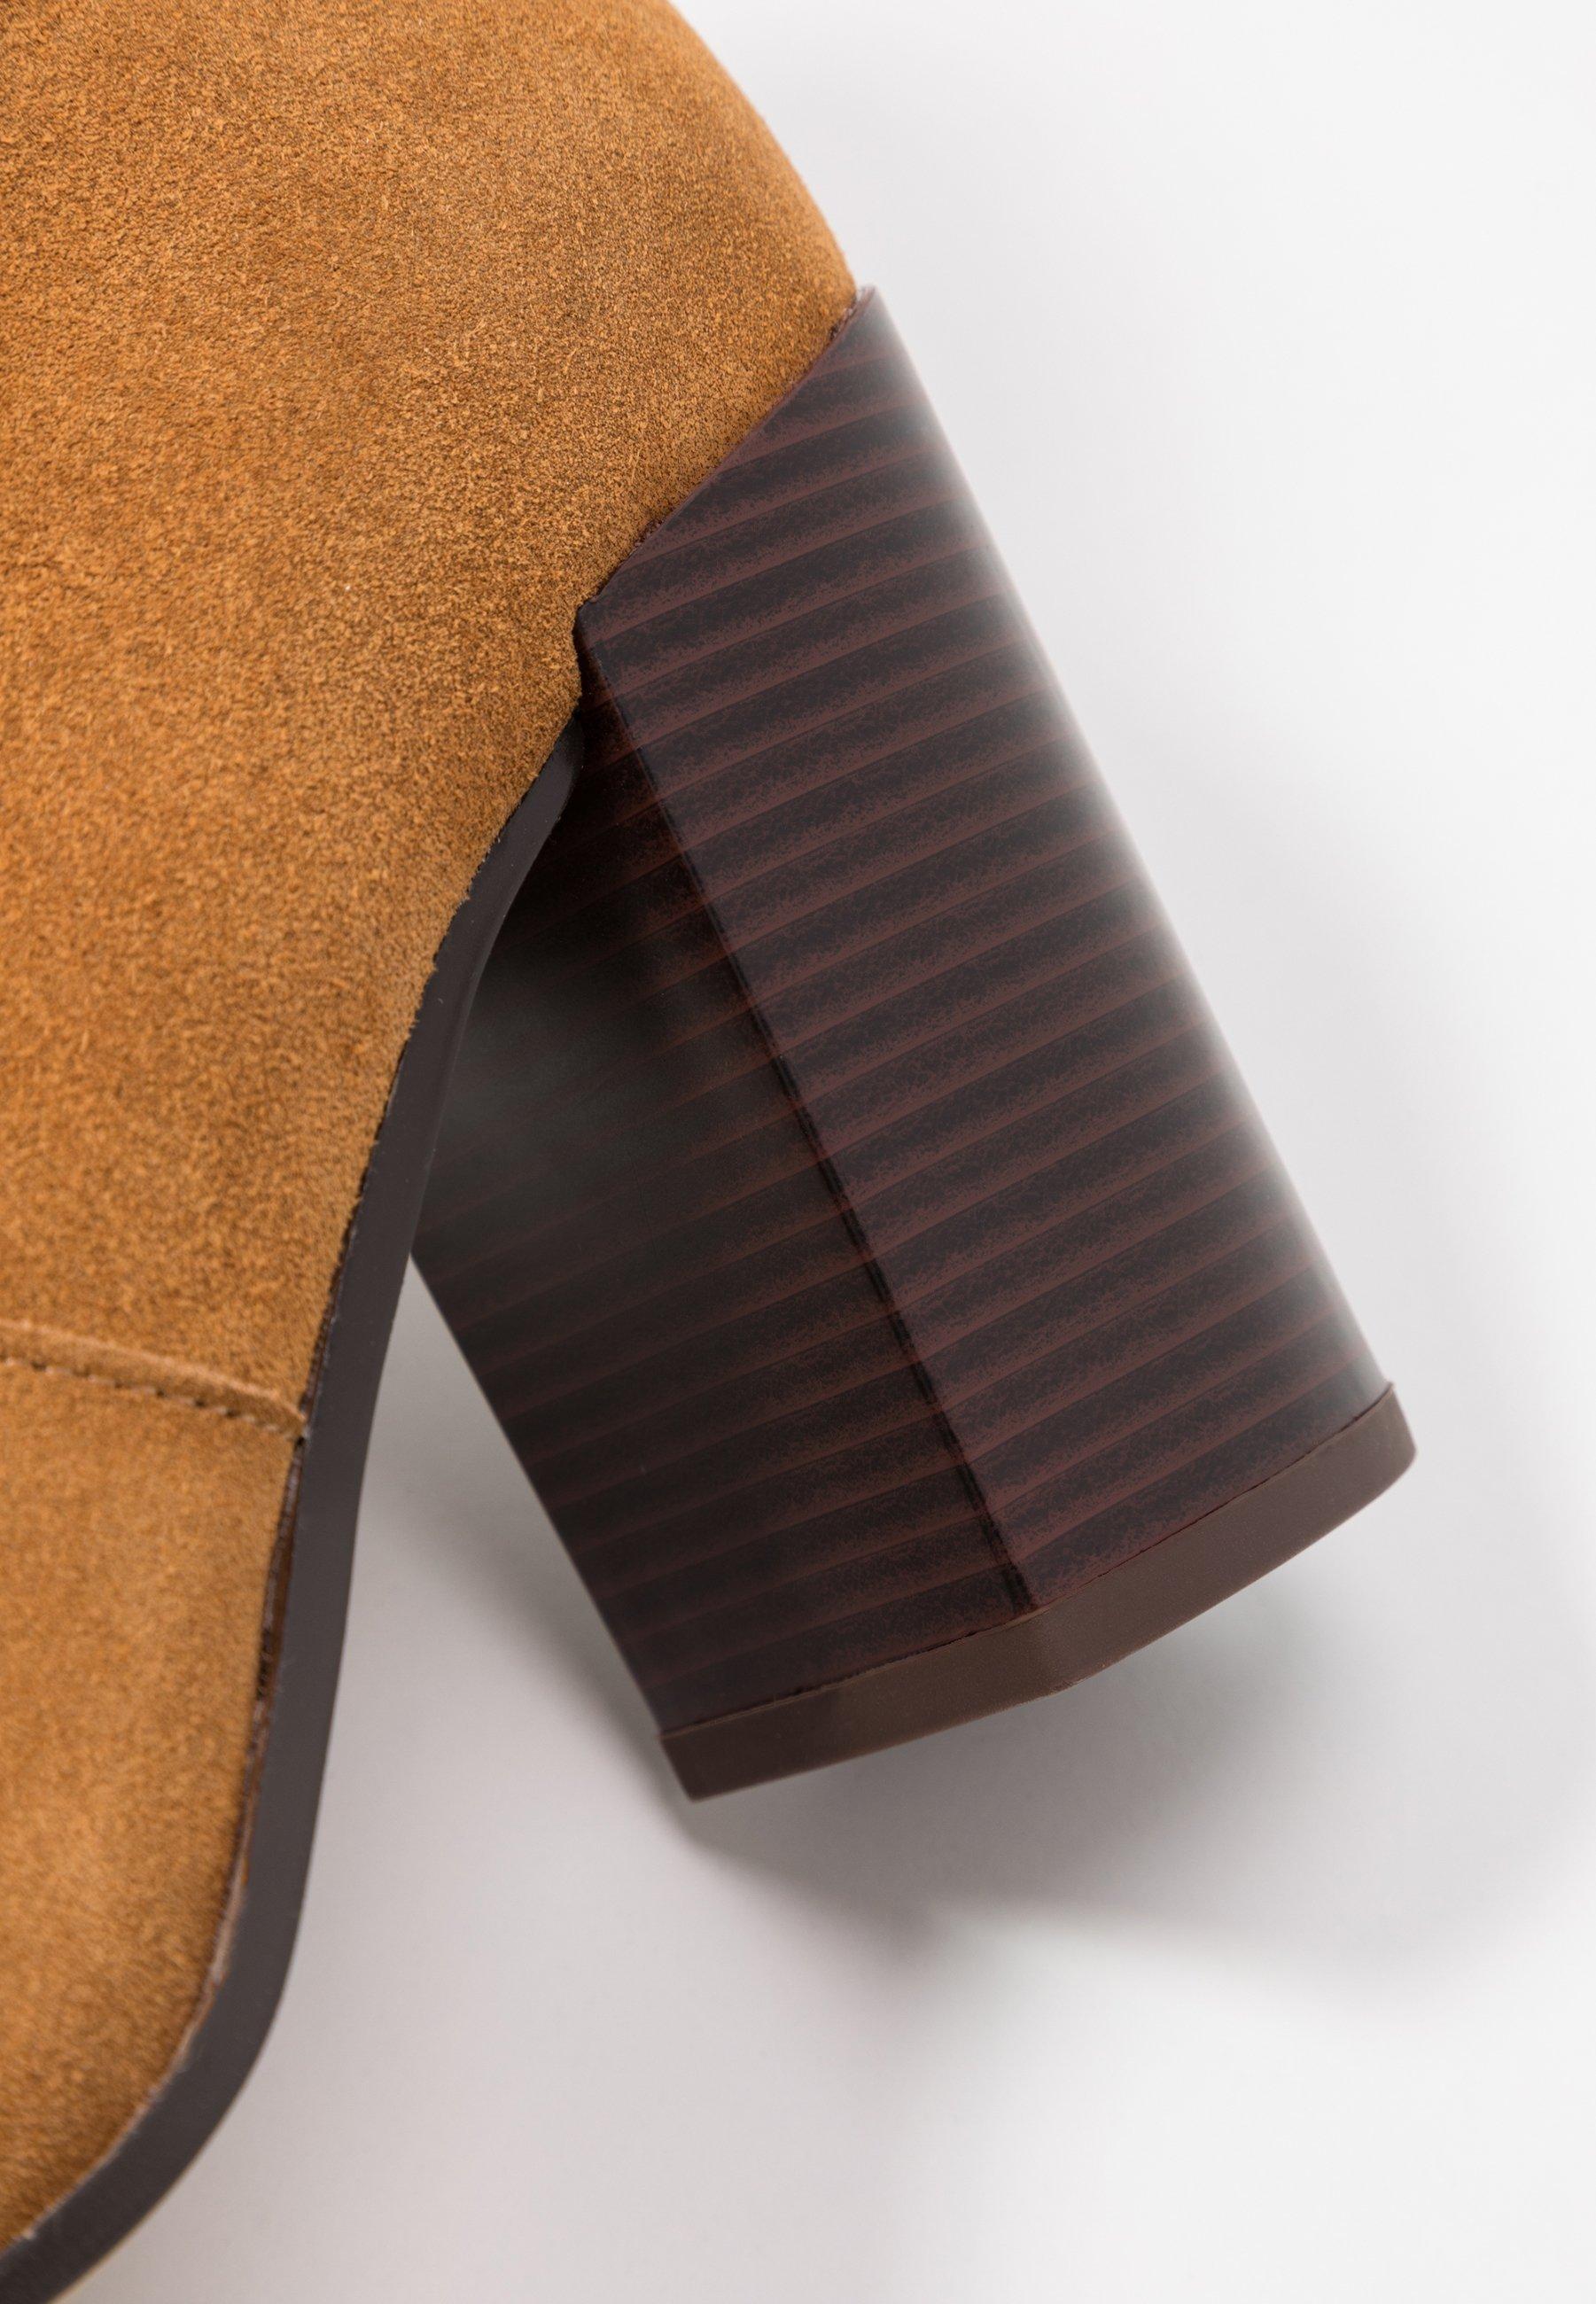 Aldo Seveiria - Stivaletti Con Tacco Medium Brown 62pGnBS